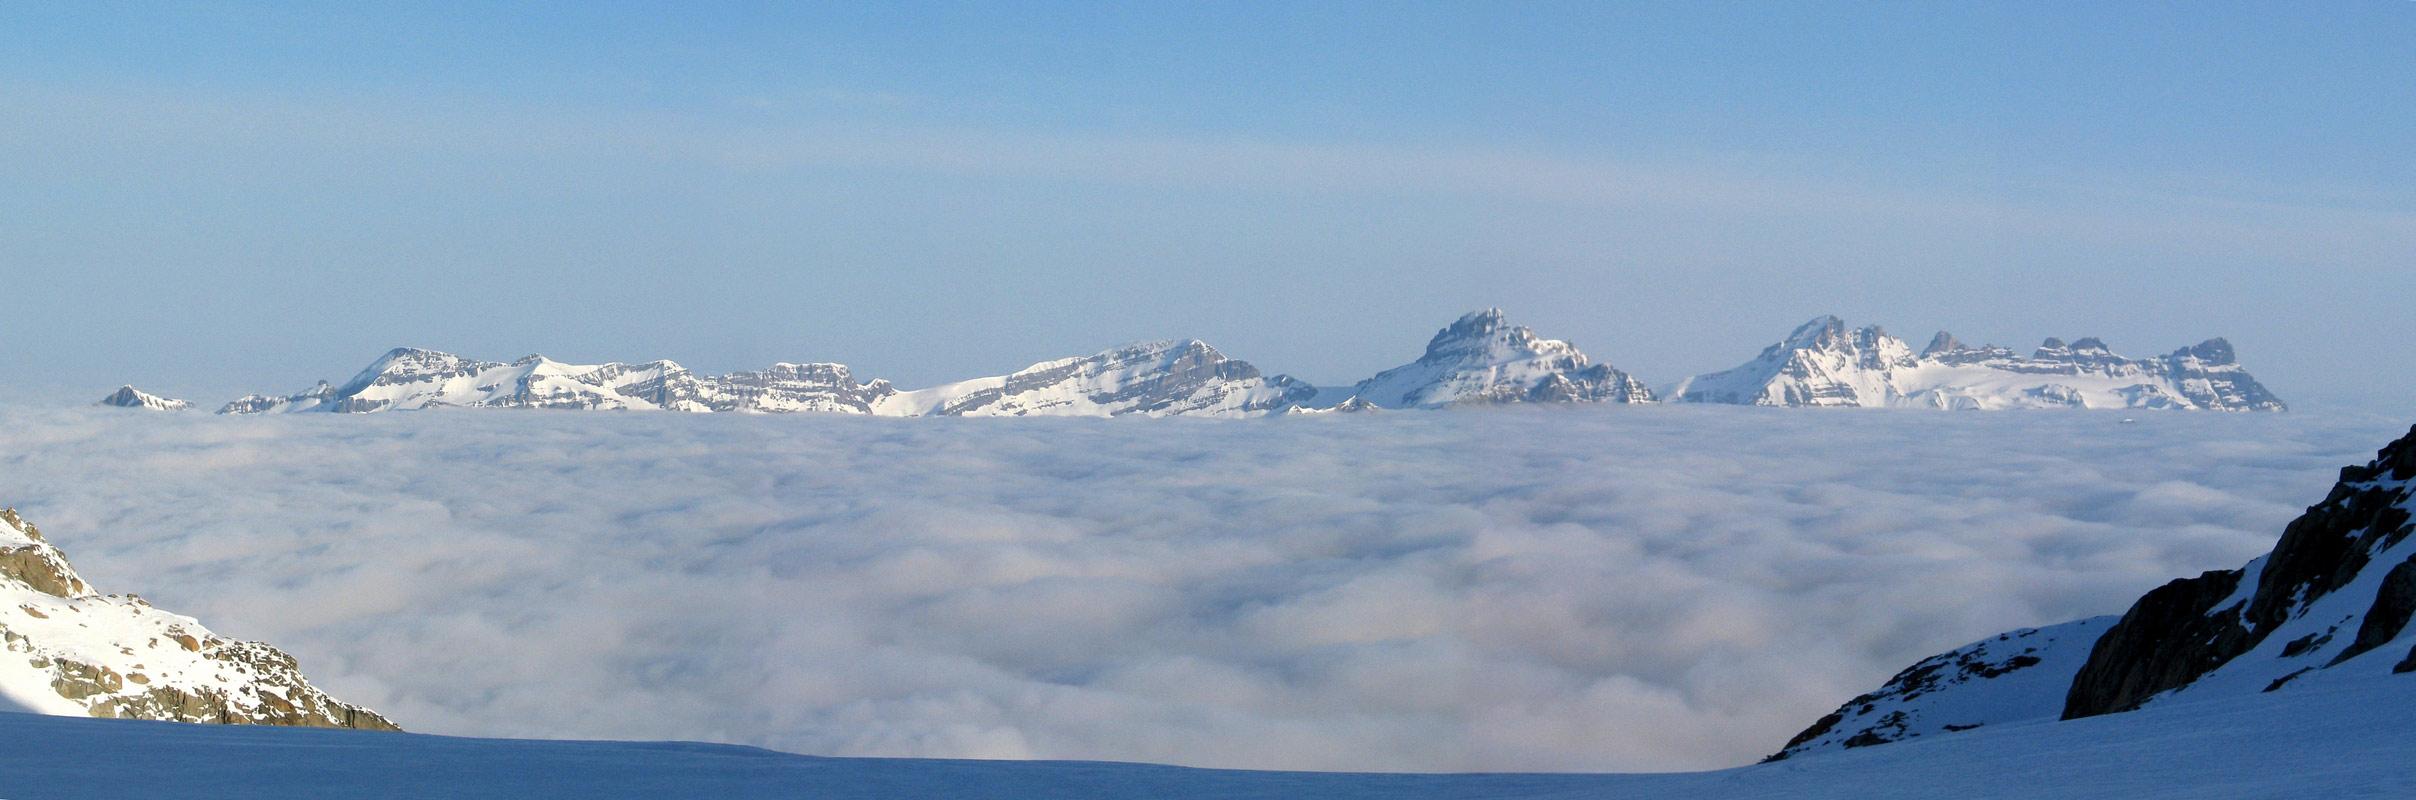 Val Arpette (Day2, H.R. Chamonix-Zermatt) Walliser Alpen / Alpes valaisannes Švýcarsko panorama 17